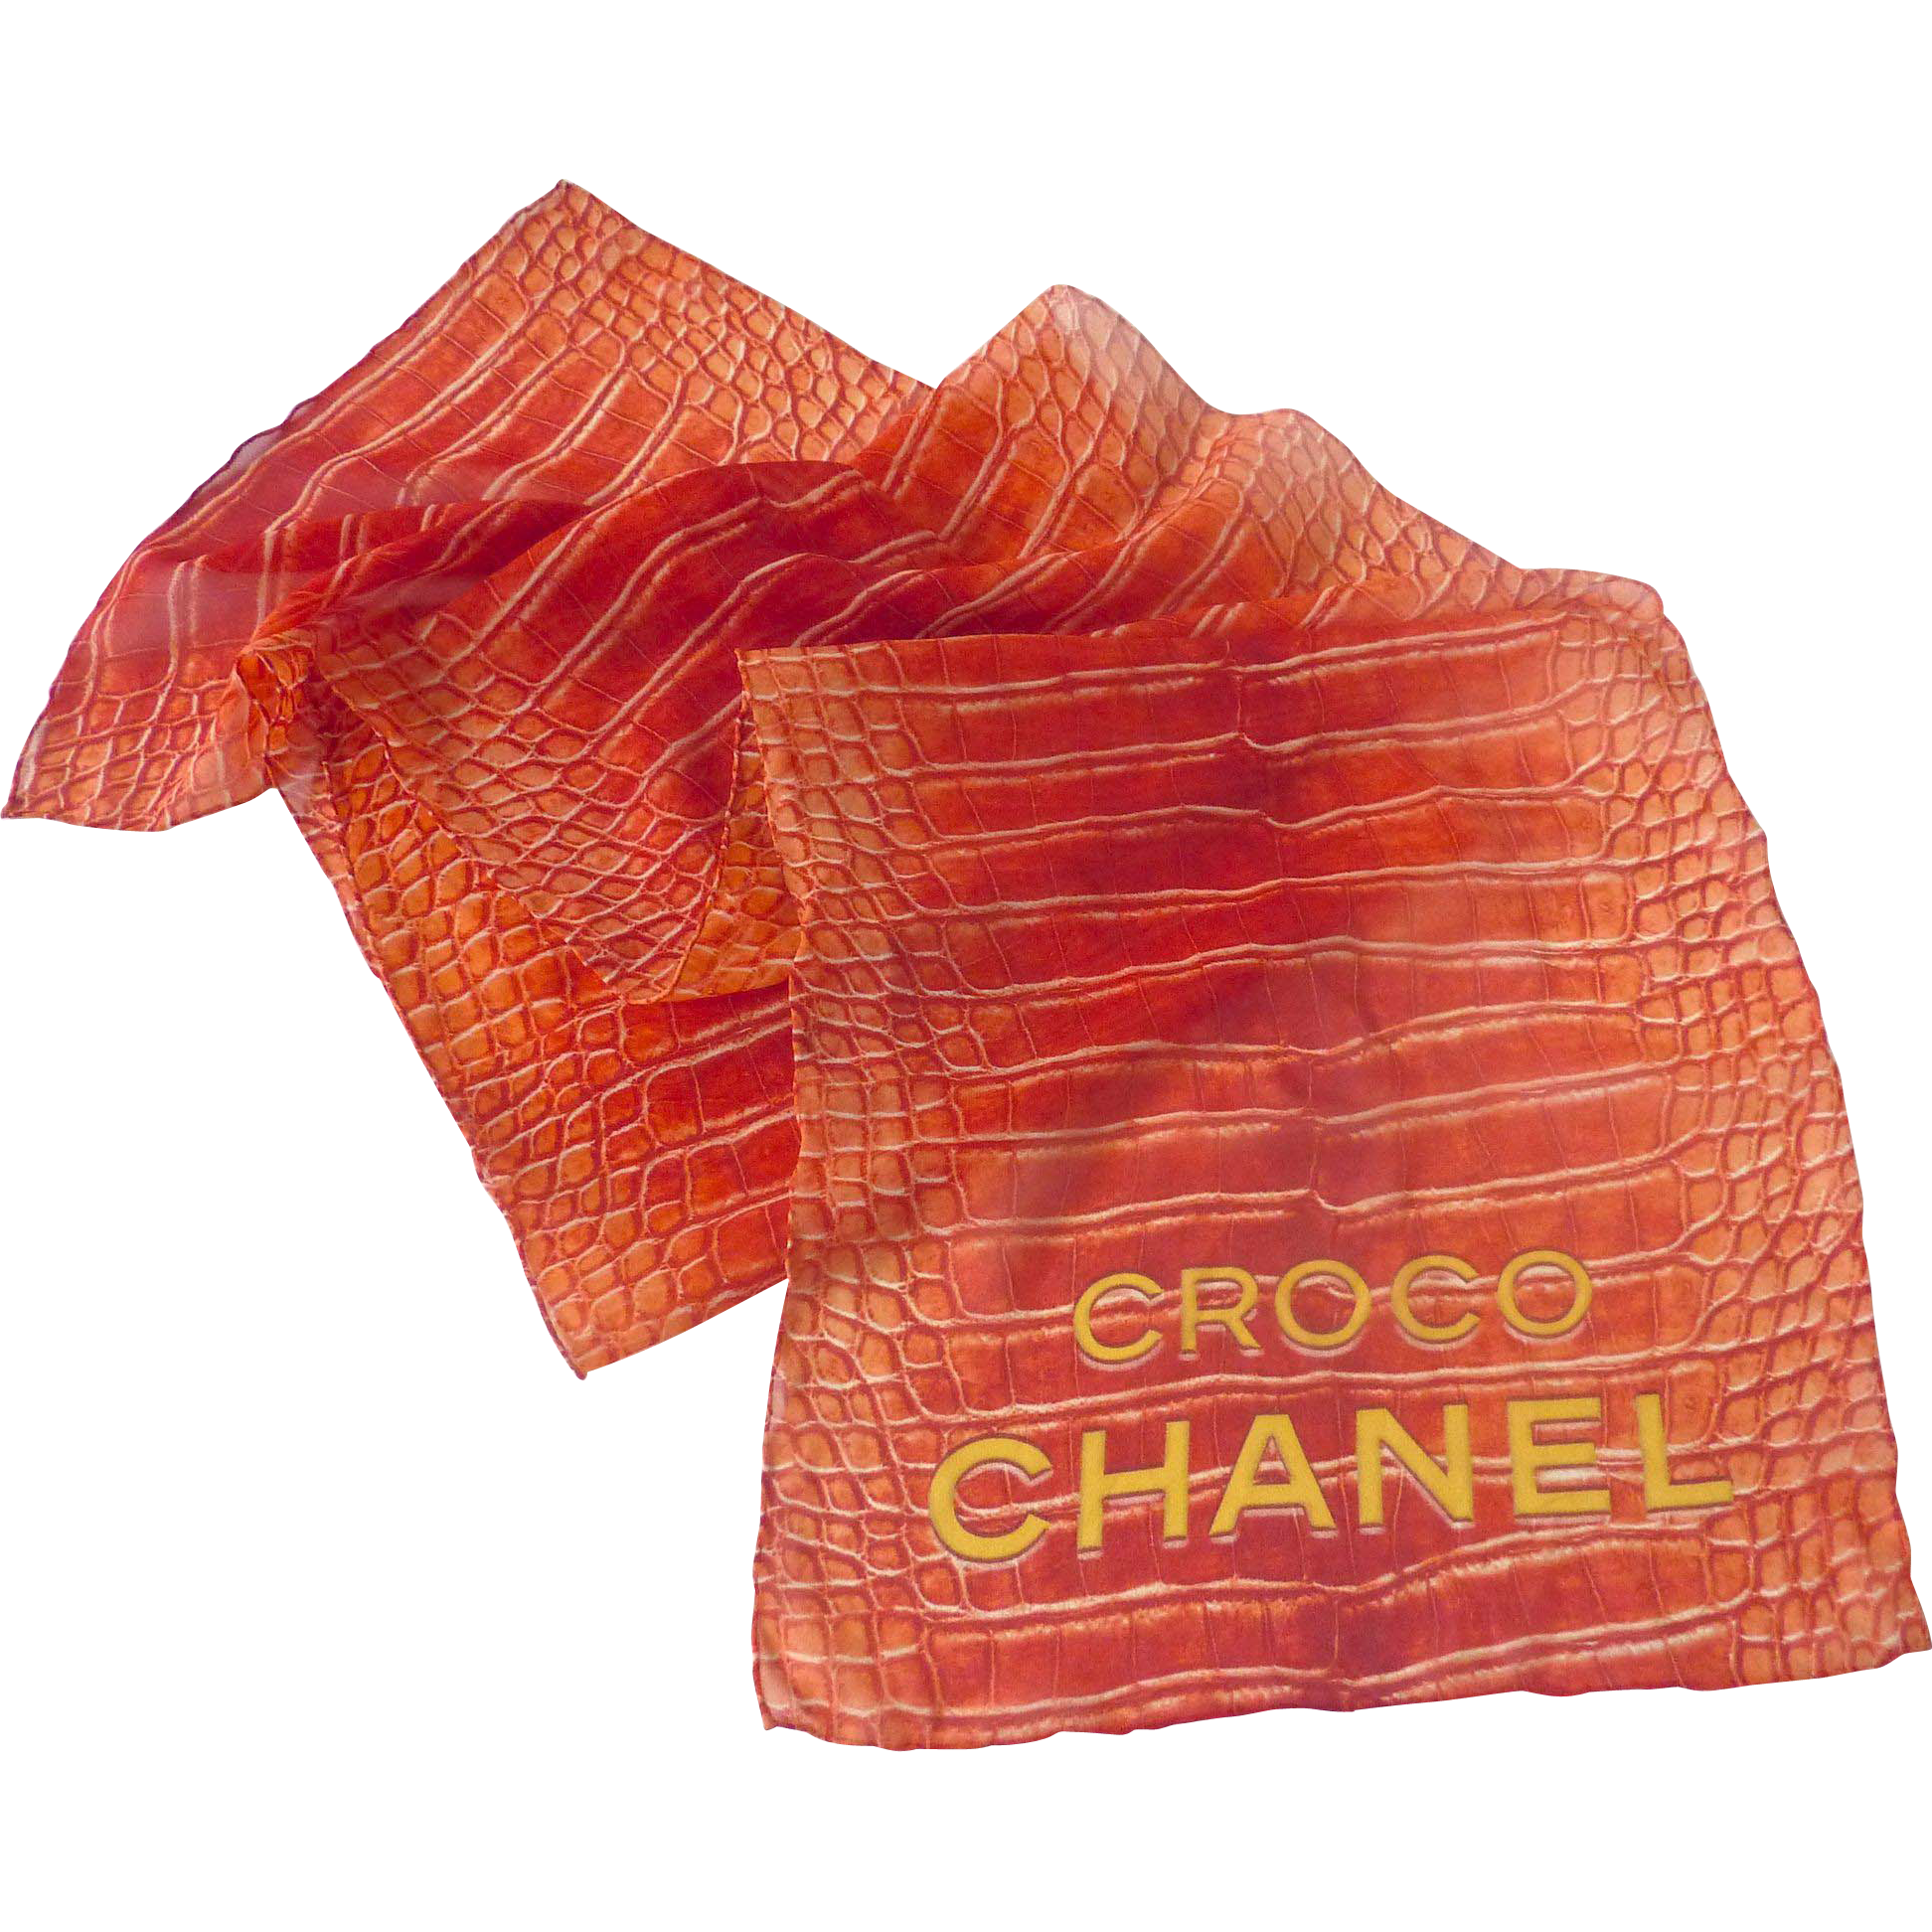 "RARE Vintage CHANEL Red Crocodile Print Silk Chiffon SCARF Stole 12"" x 52"""